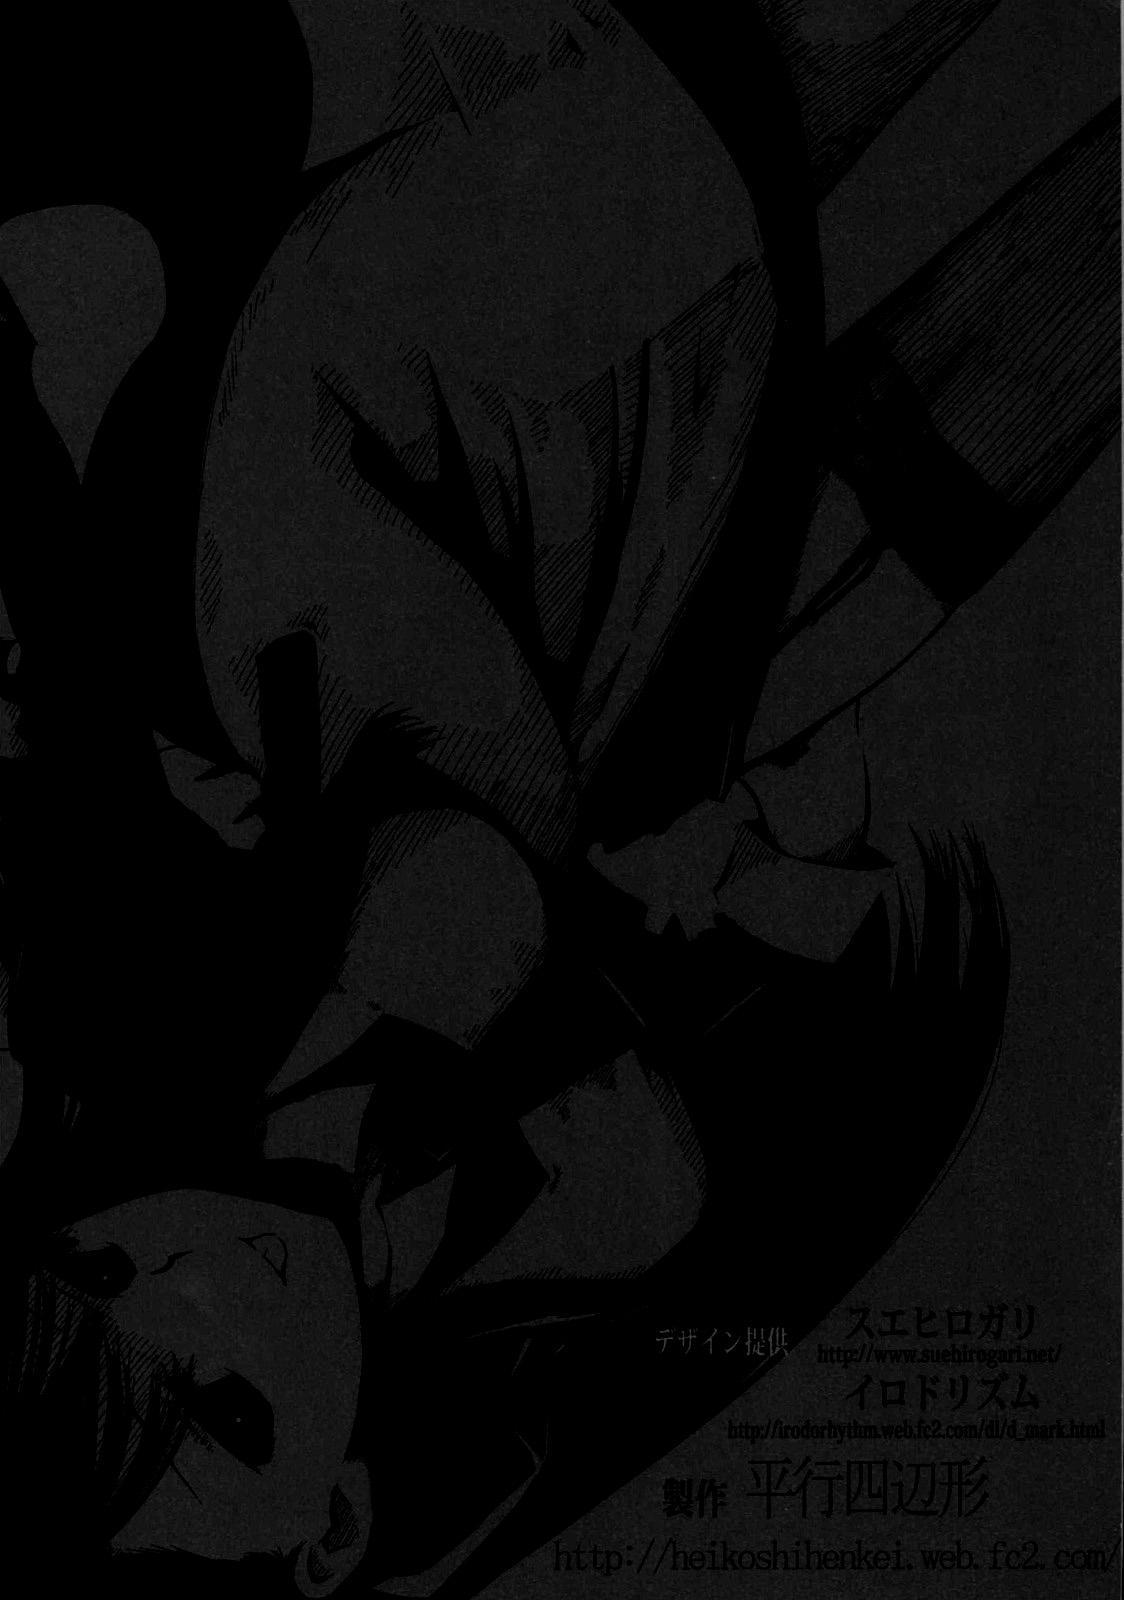 [Heikoushihenkei (Kawanakajima)] Akui-san ga Kaze hi-ta 1 | 阿九井小姐得了感冒1 [Chinese] [lolipoi汉化组] [2014-06-10] 45